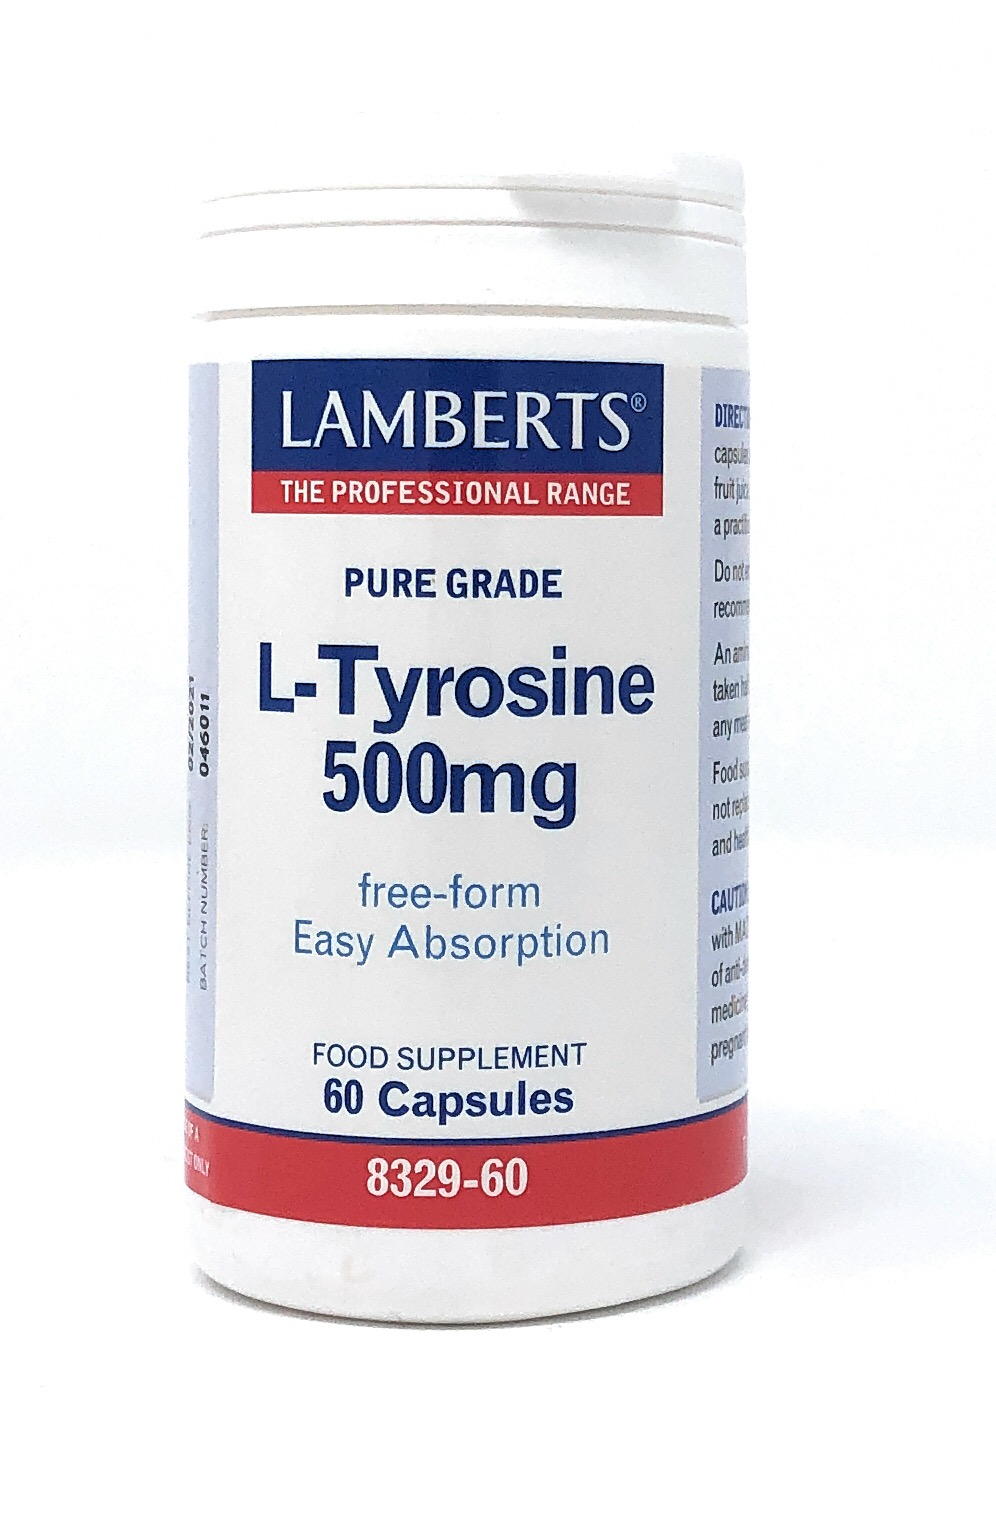 Lamberts Healthcare Ltd. L-TYROSINE 500mg 60 Kapseln